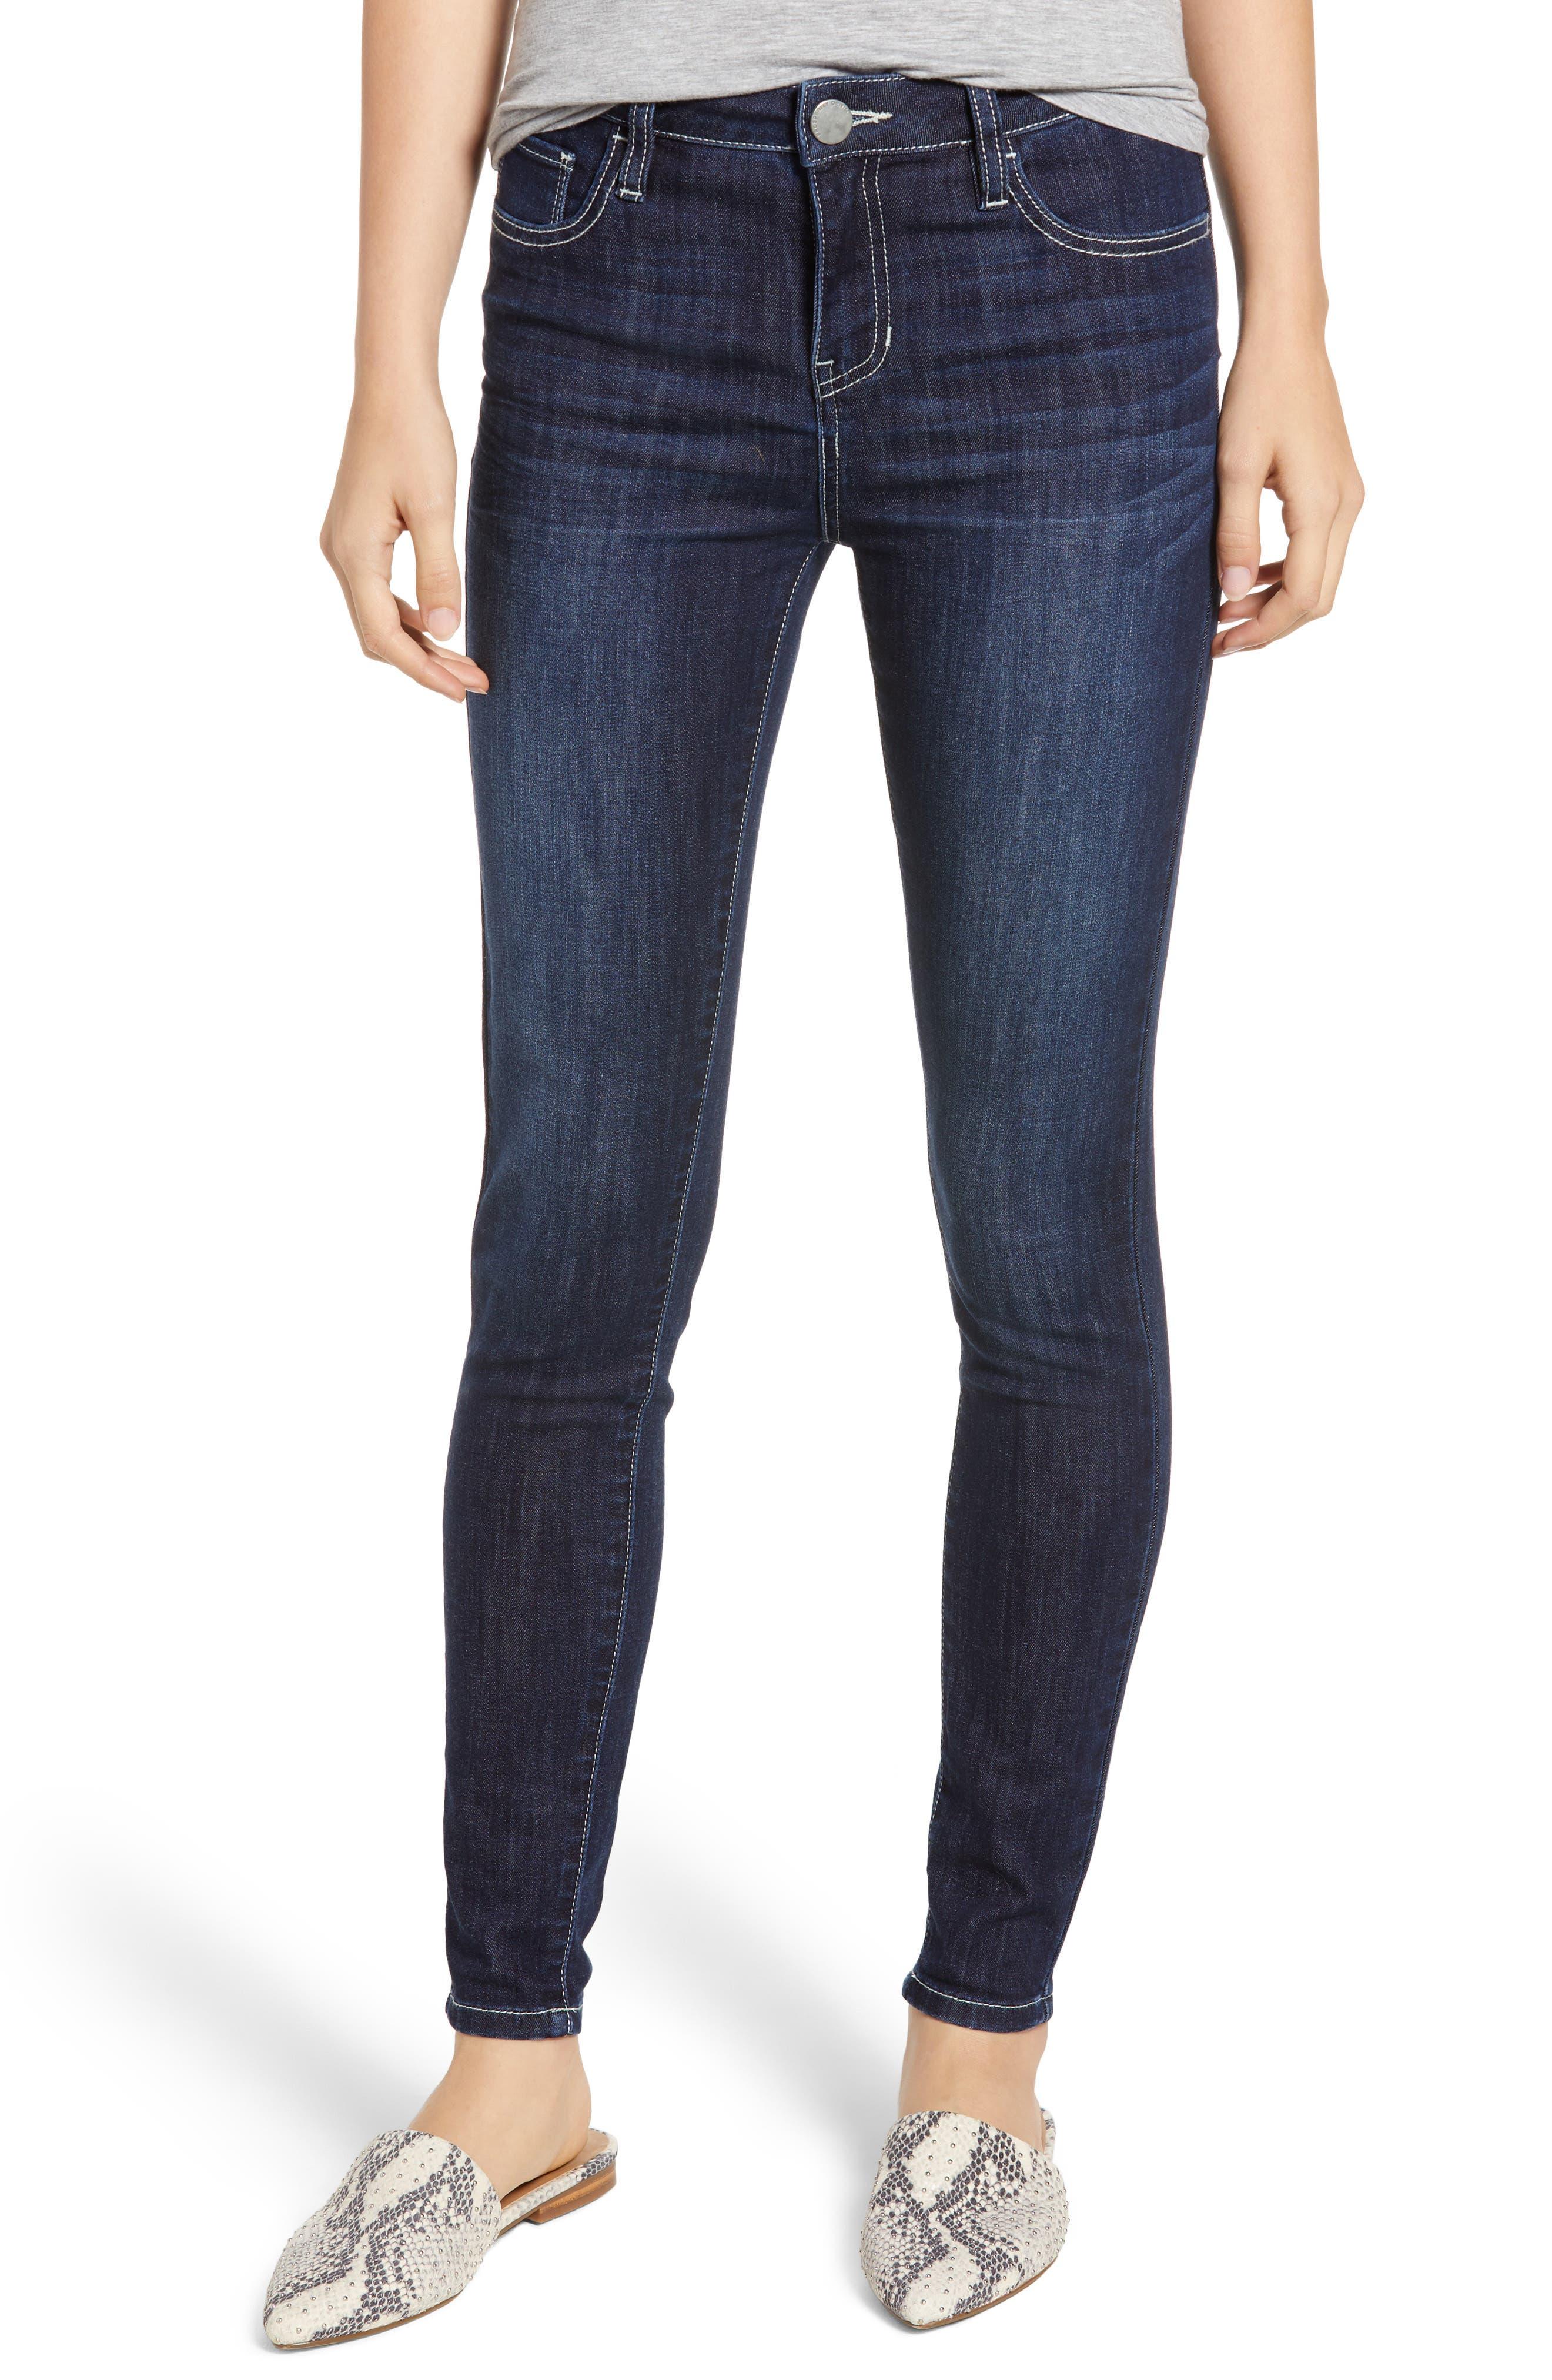 PROSPERITY DENIM, Contrast Stitch Skinny Jeans, Main thumbnail 1, color, DARK WASH